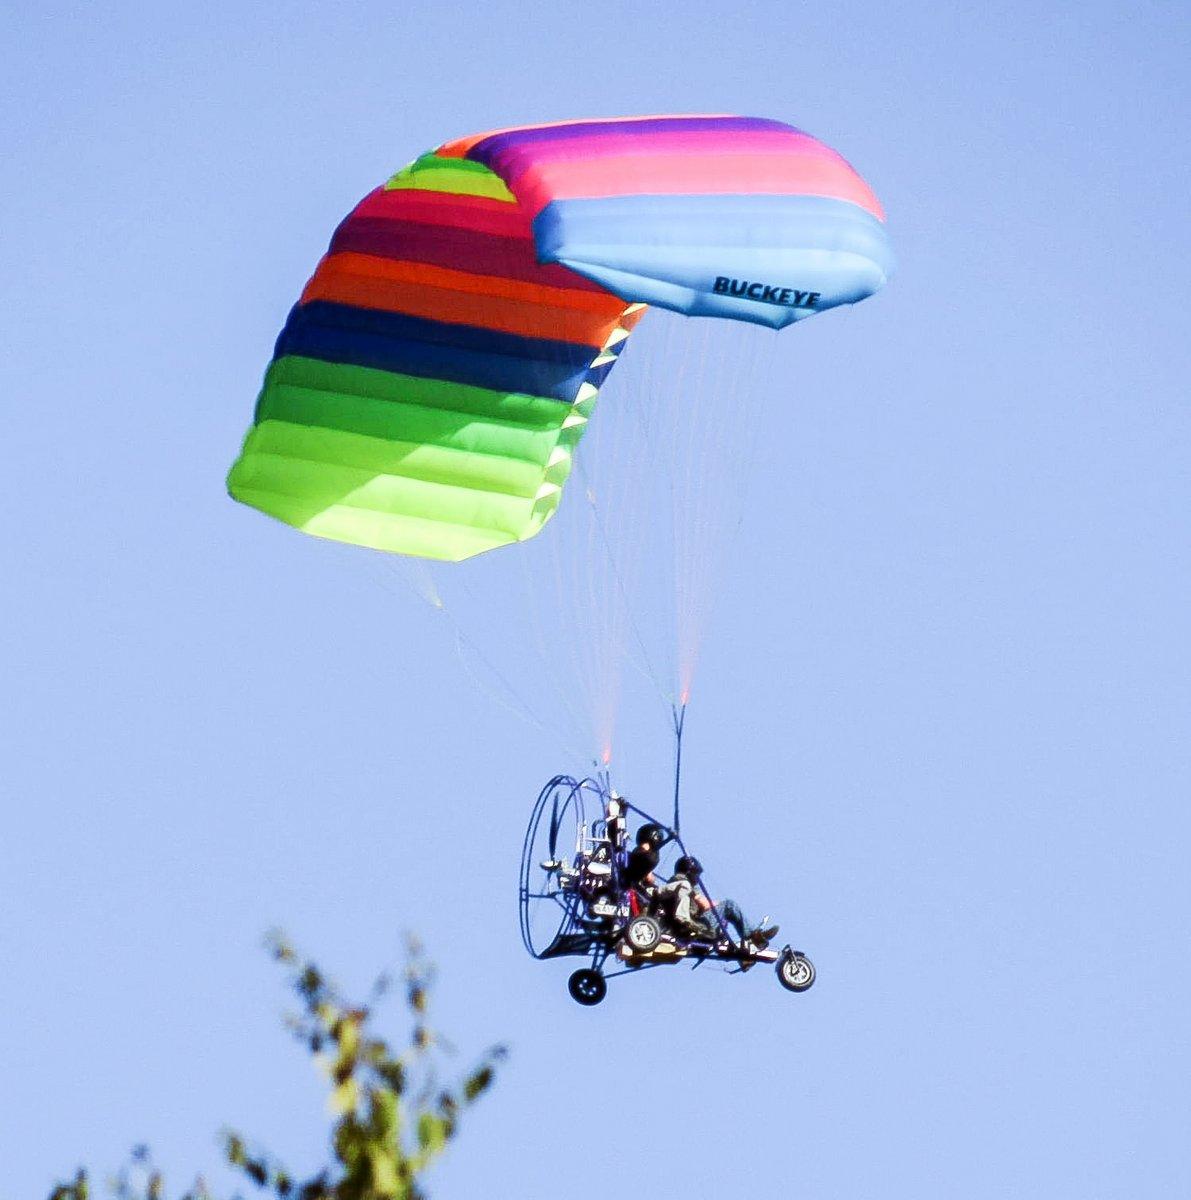 6. Flying Machine